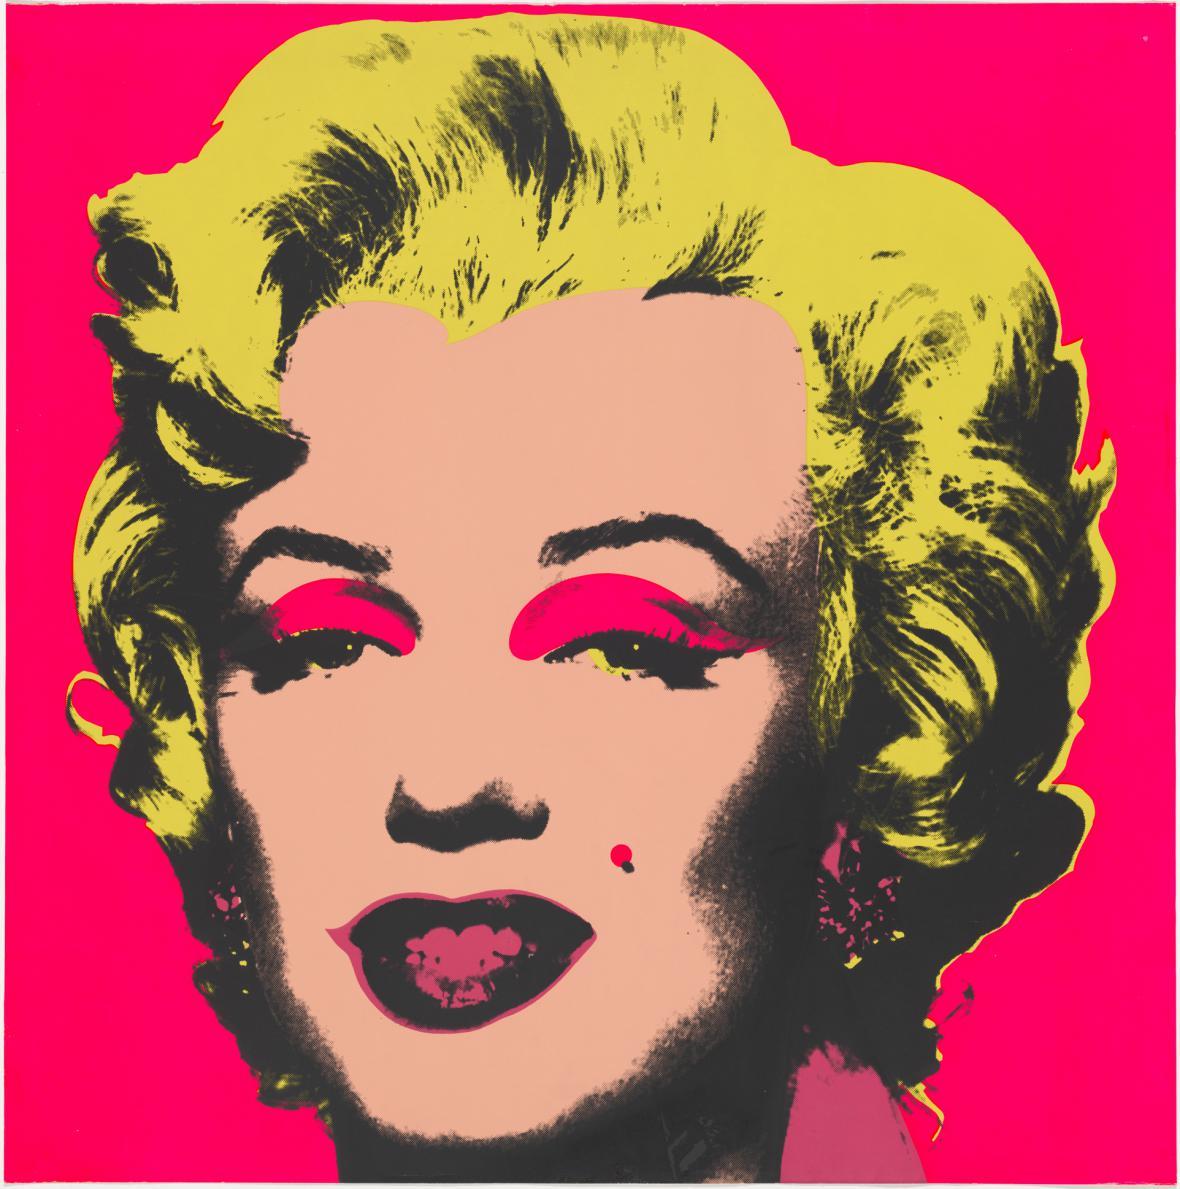 Andy Warhol / Marilyn Monroe